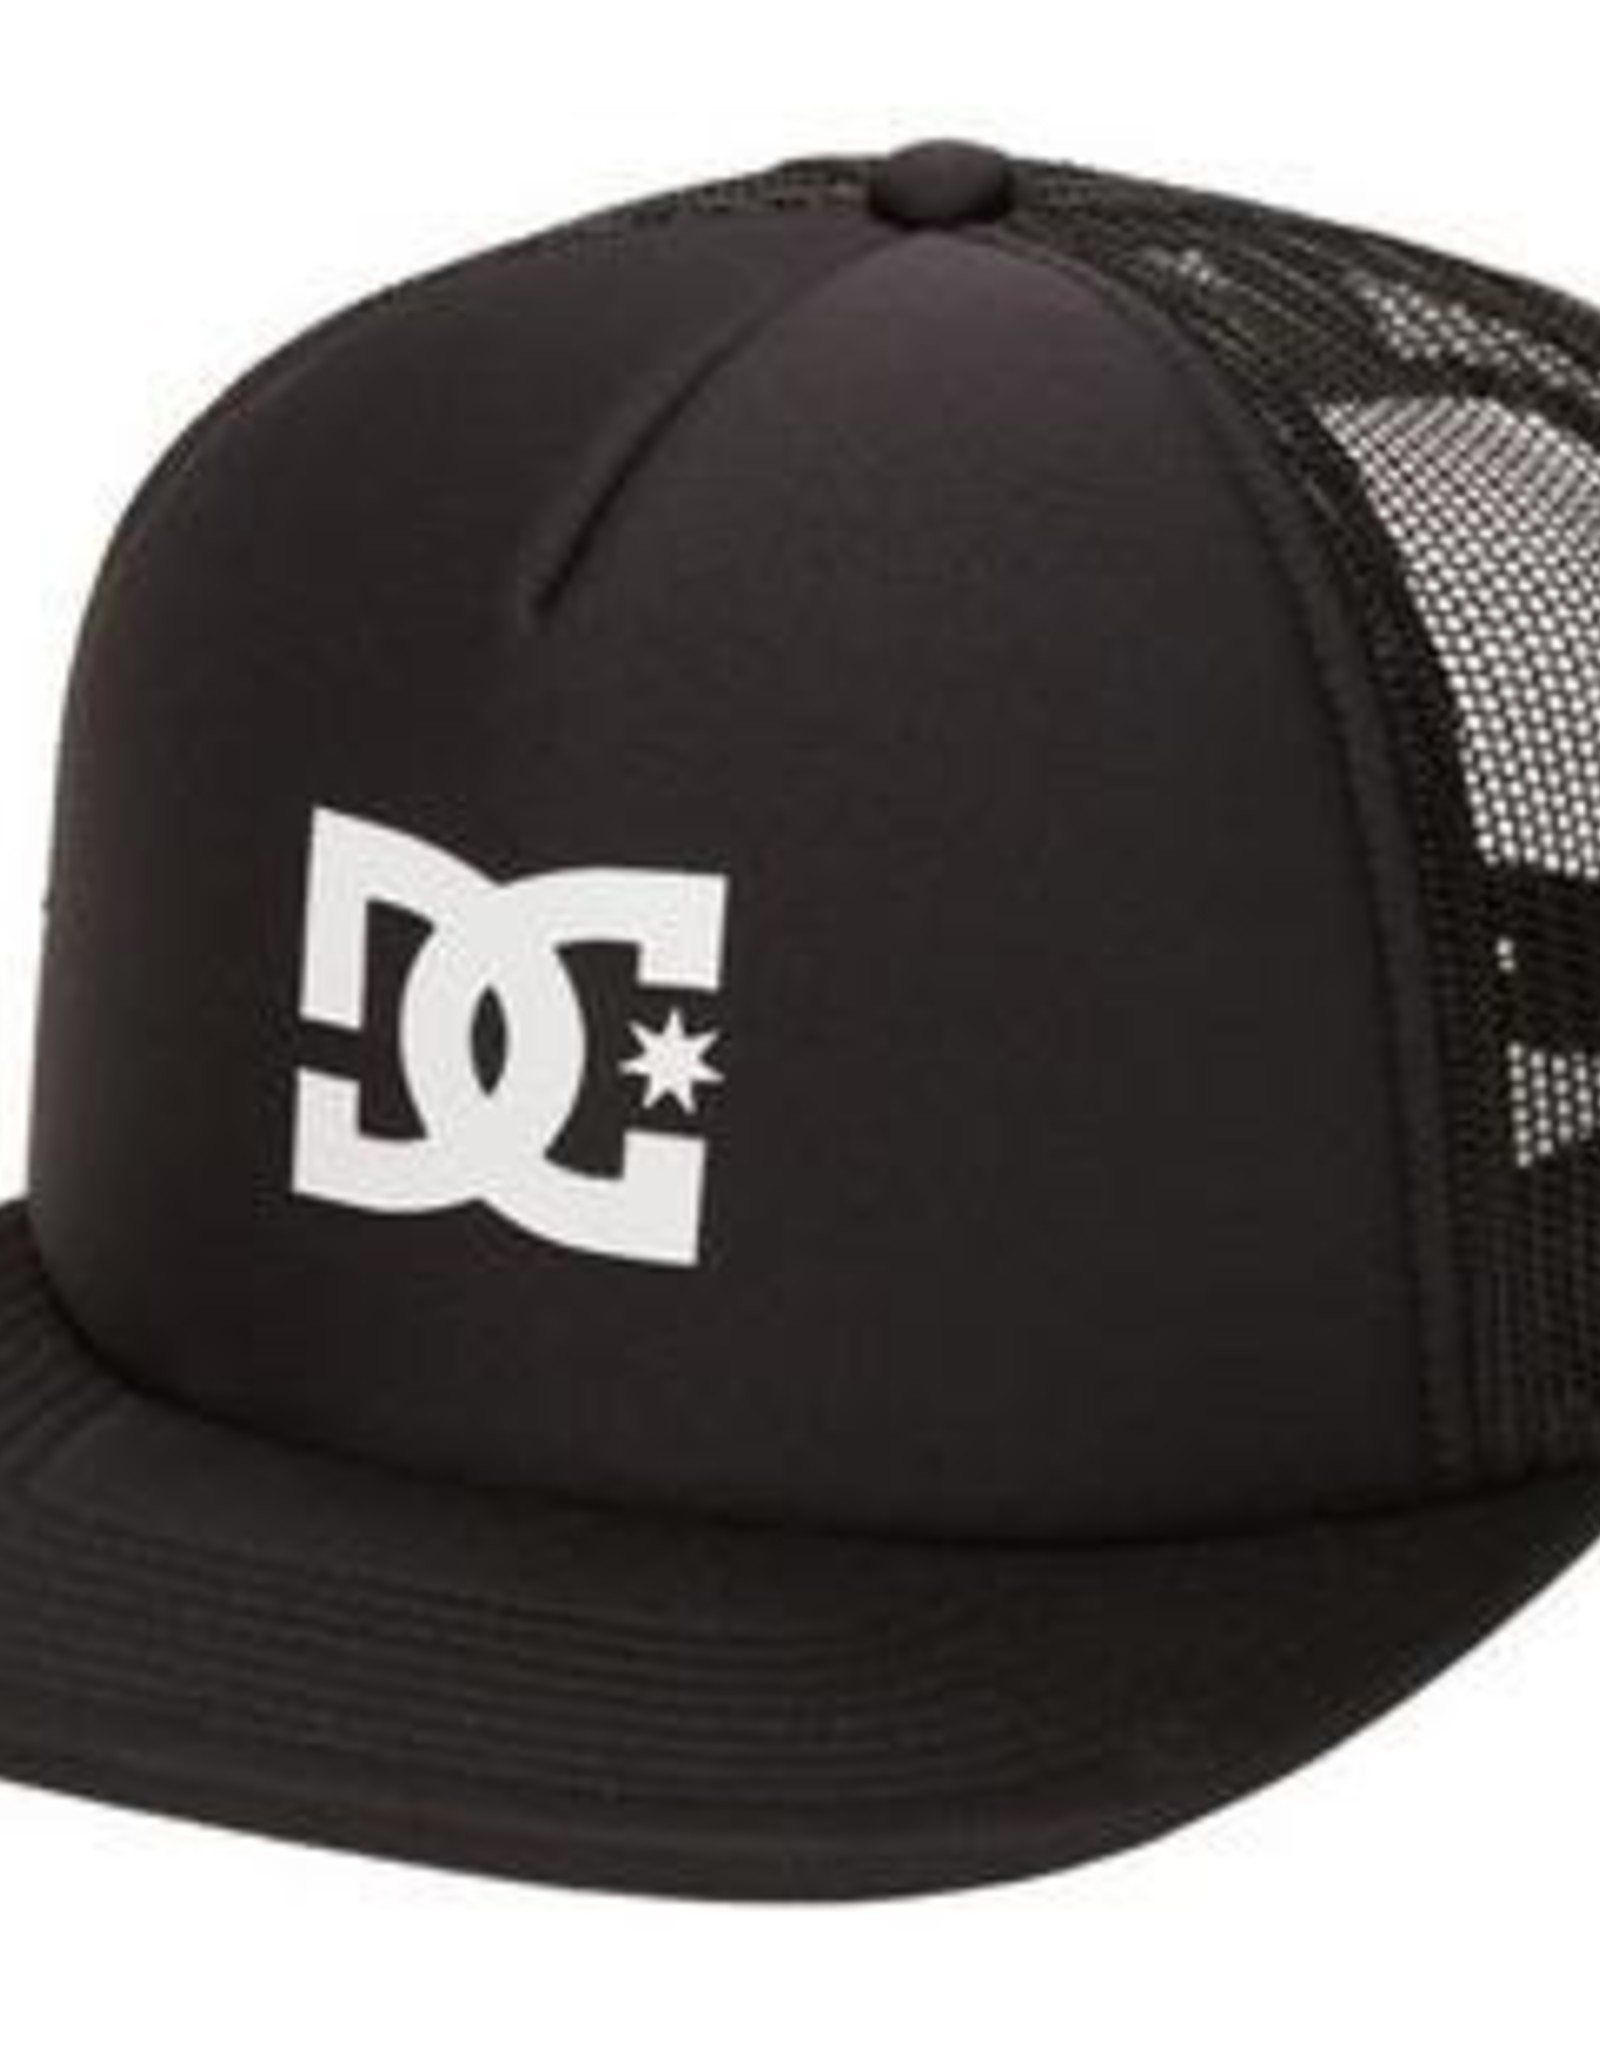 DC SP21 Gas Station Trucker Hat